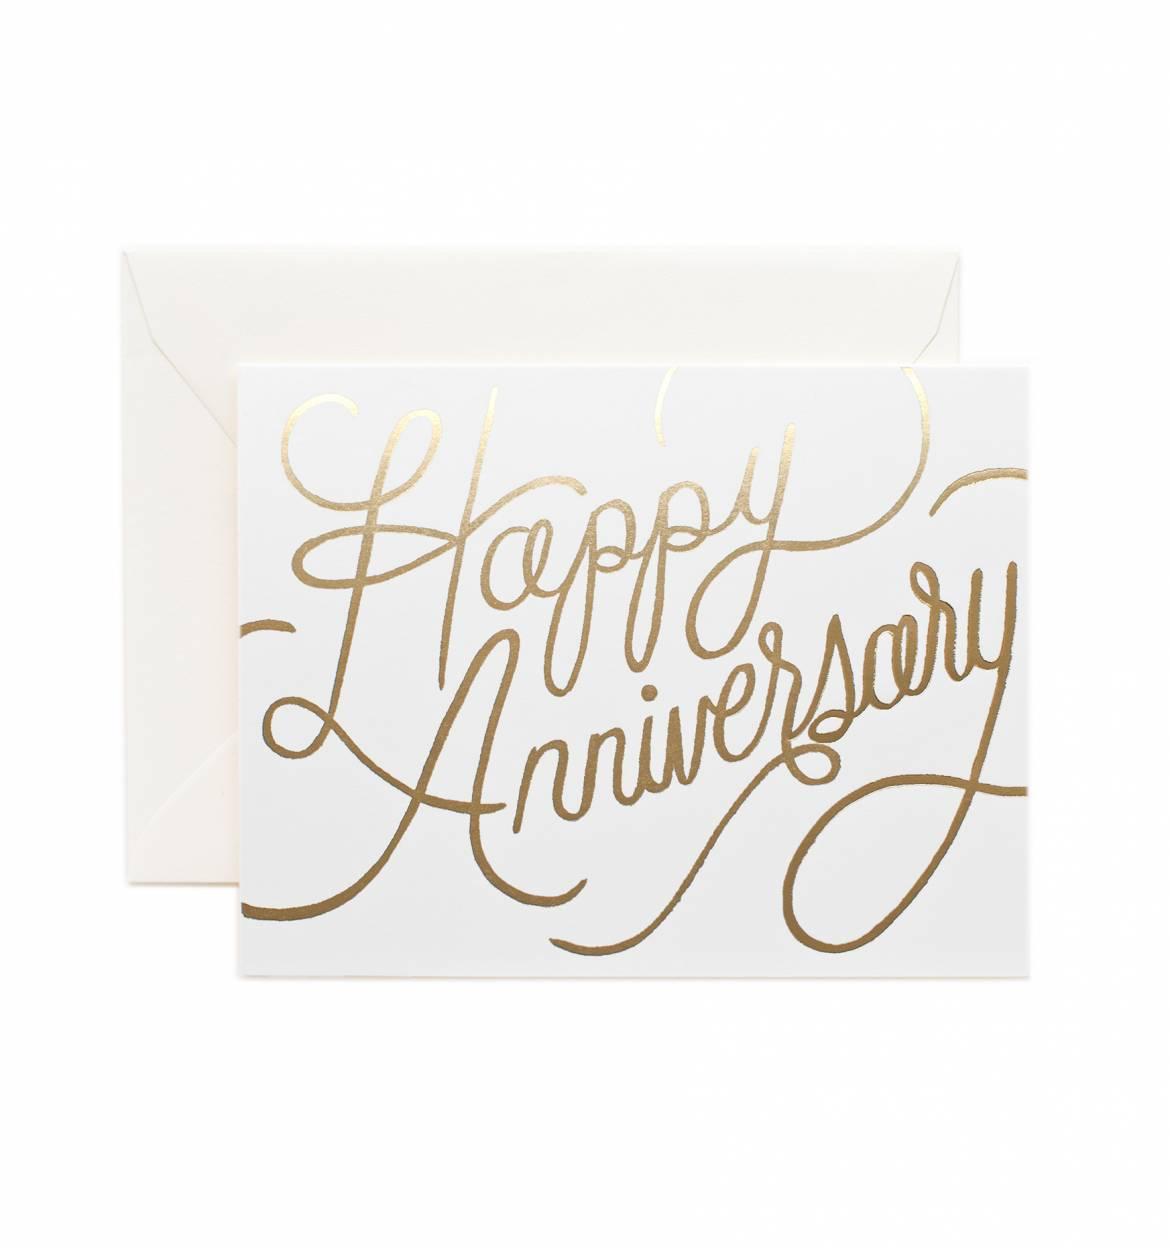 happy-anniversary-wedding-greeting-card-single-01_3.jpg